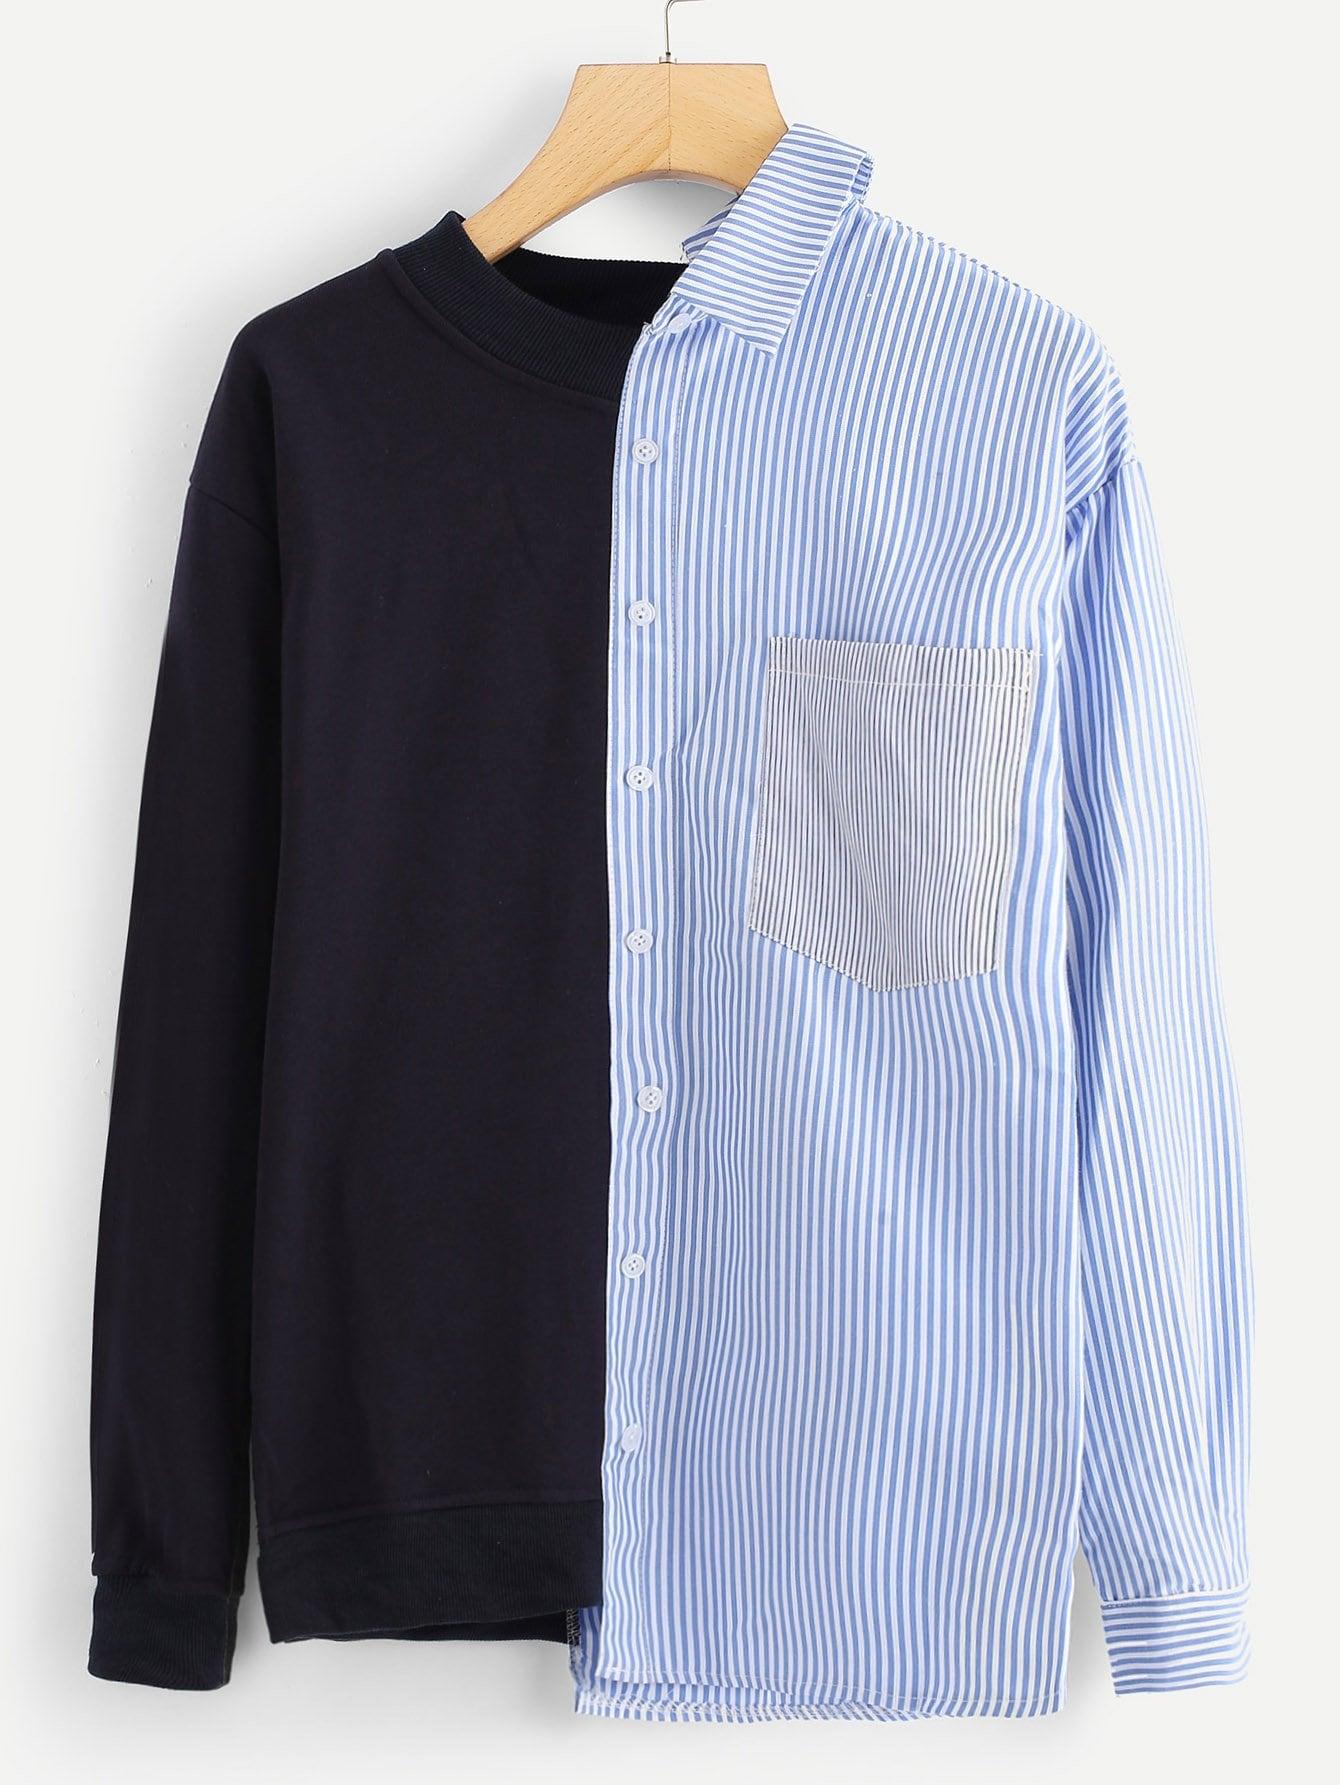 Cut And Sew Panel Striped Sweatshirt